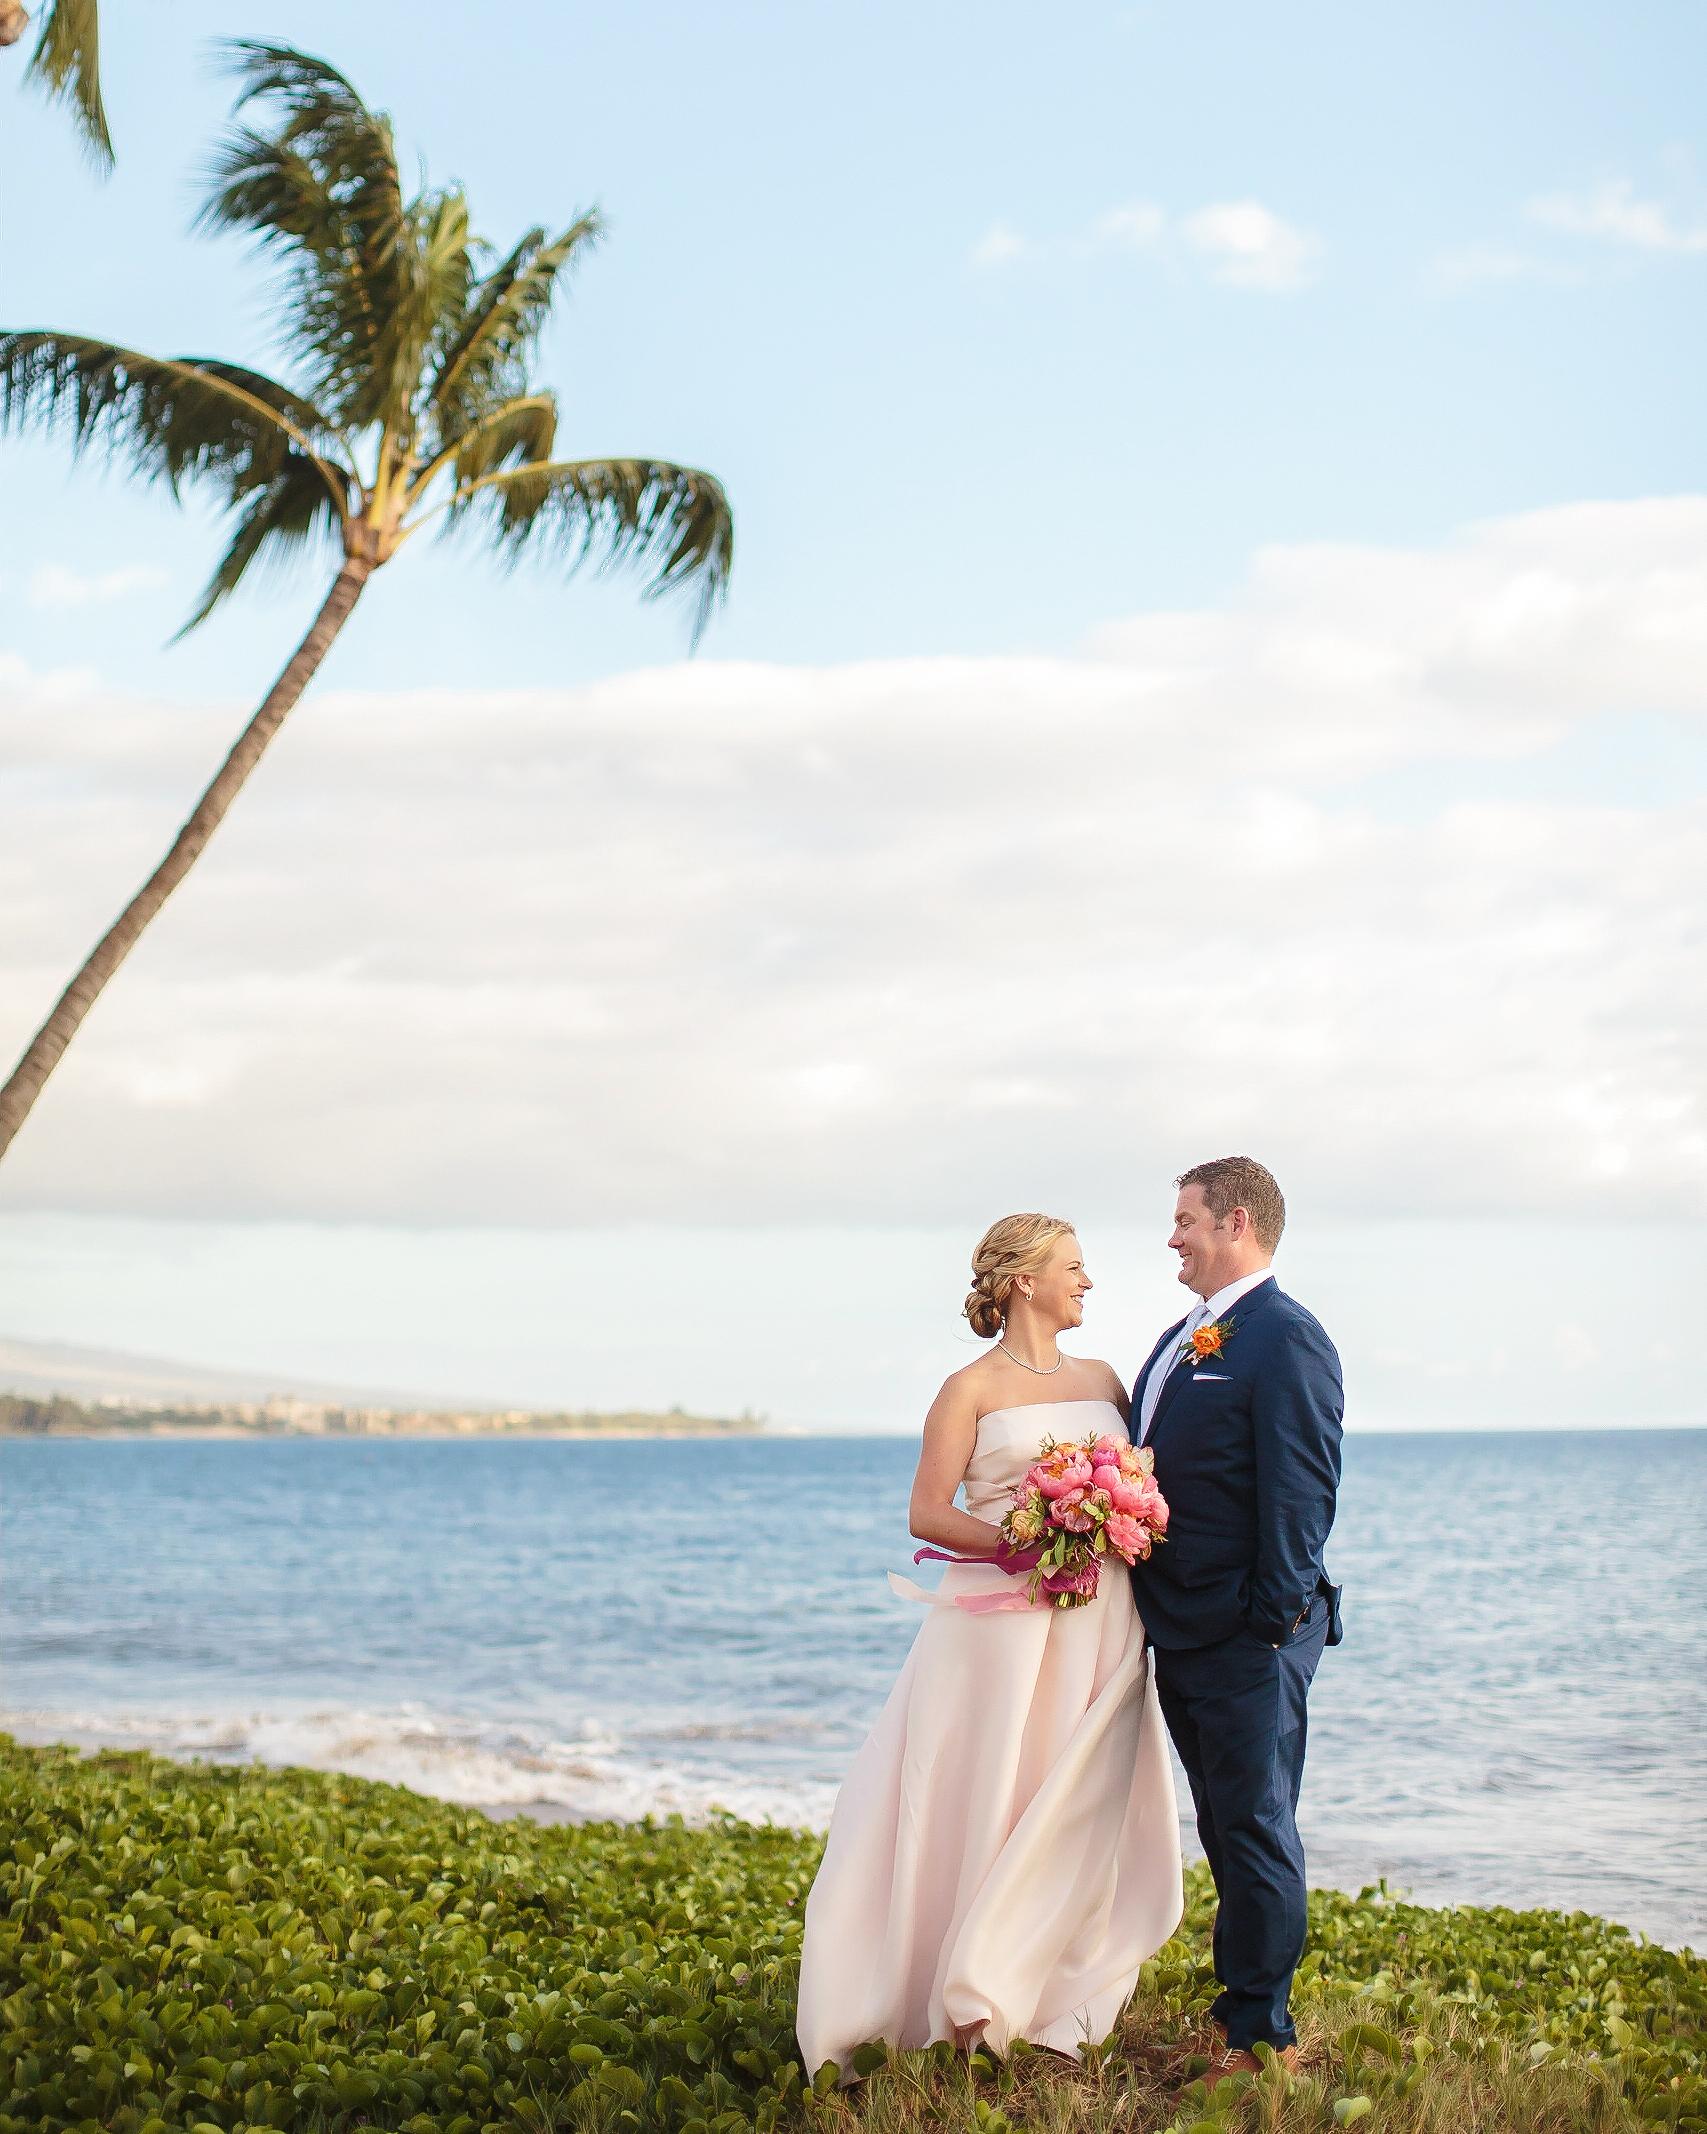 christen-tim-wedding-couple-22068-6143924-0816.jpg